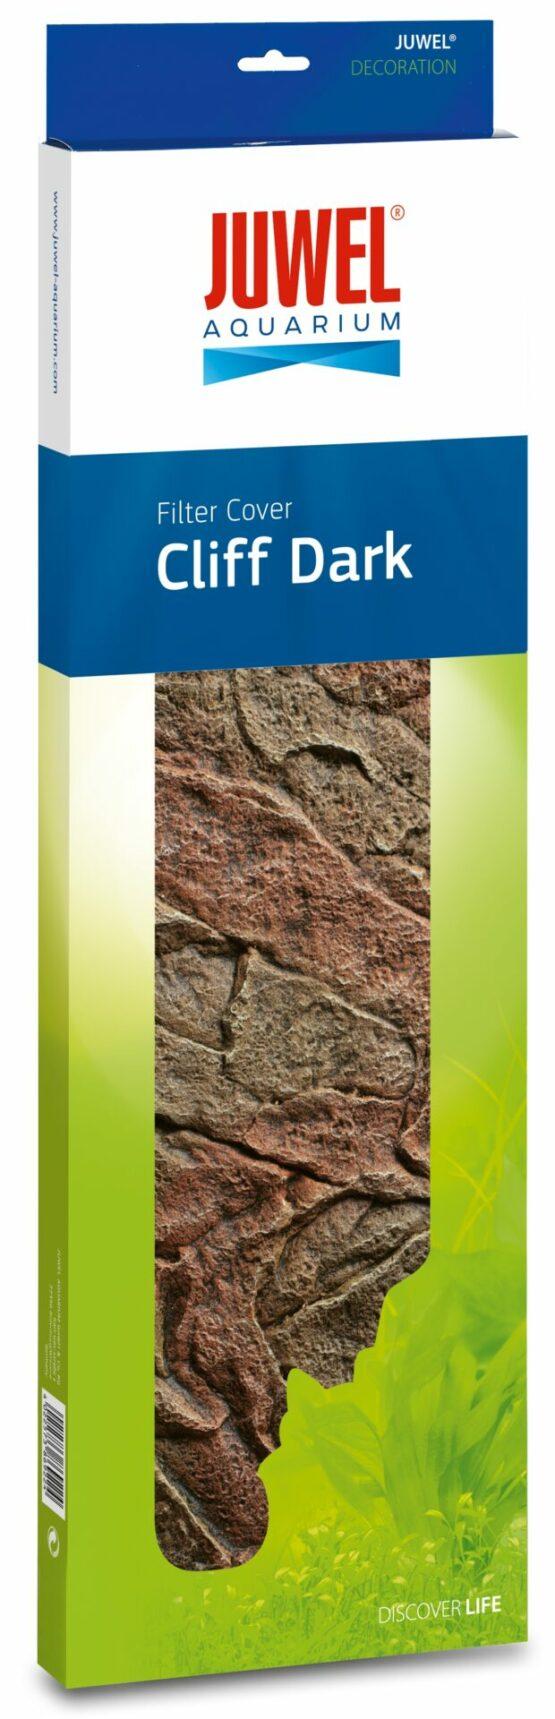 Filter Cover Cliff Dark